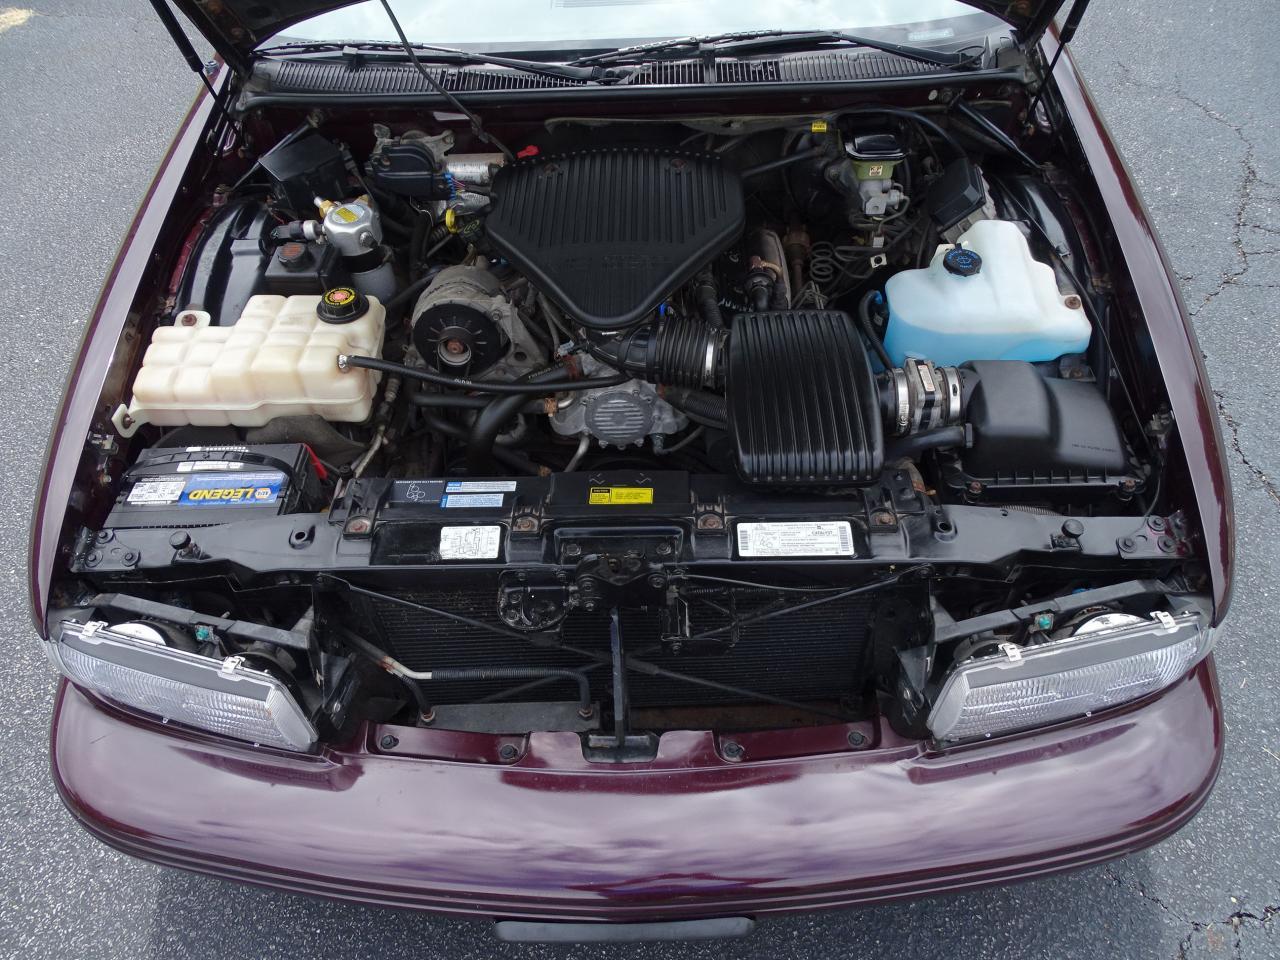 1996 Chevrolet Impala (CC-1227512) for sale in O'Fallon, Illinois